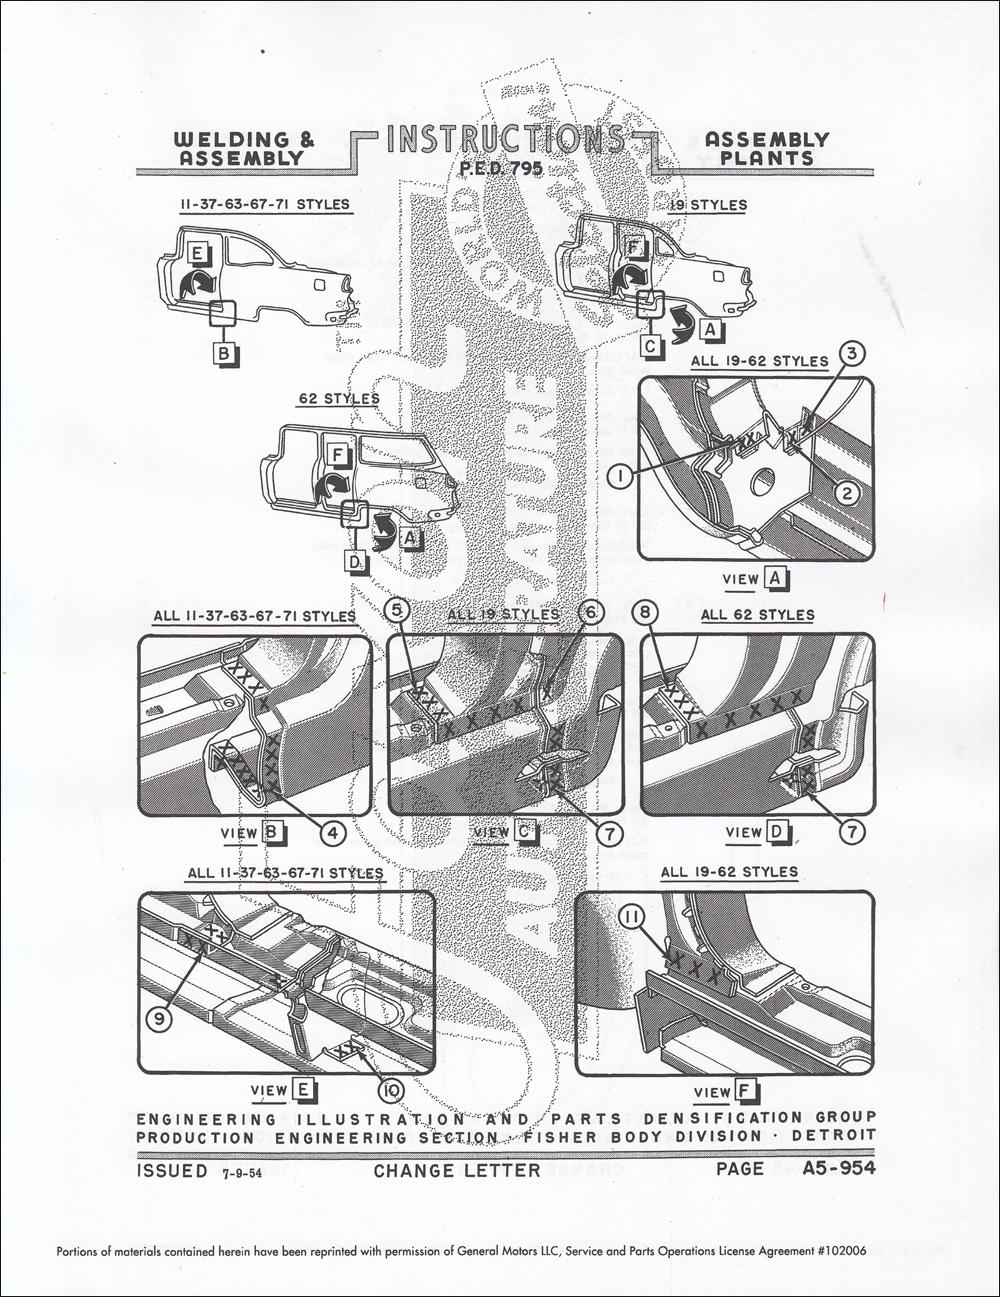 1955 chevrolet and pontiac fisher body welding assembly manual reprint rh faxonautoliterature com 1955 chevrolet shop manual 1955 chevy shop manual